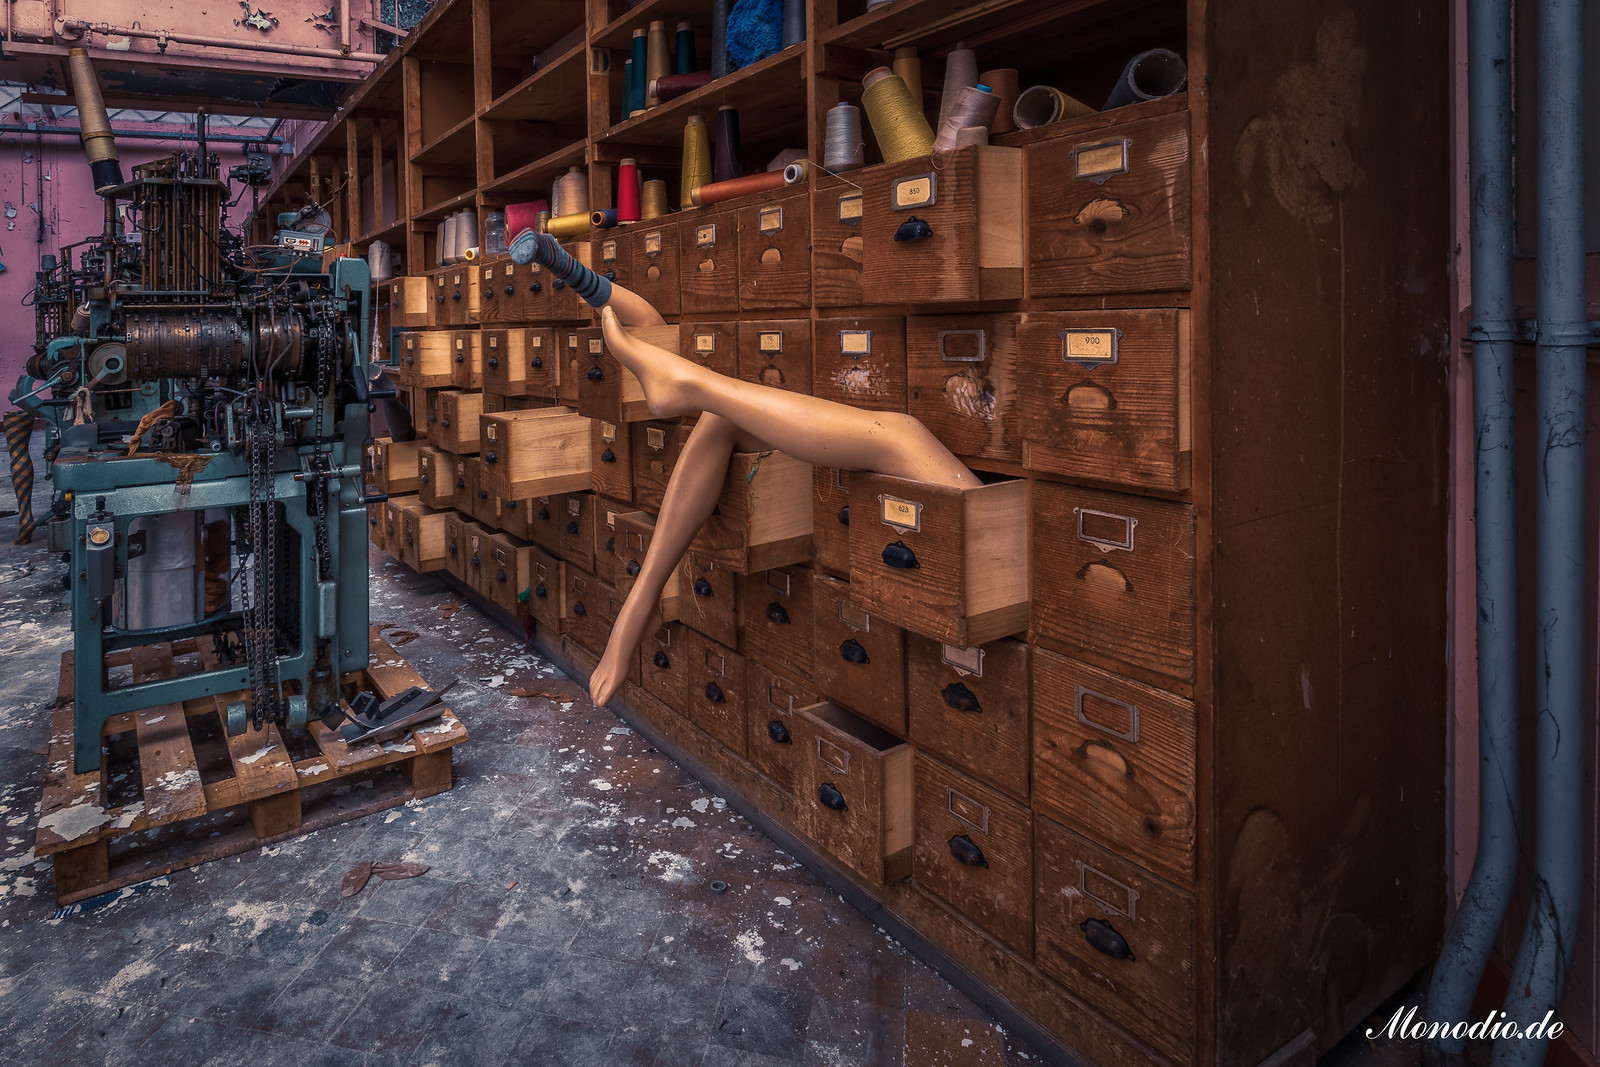 The Leg Factory